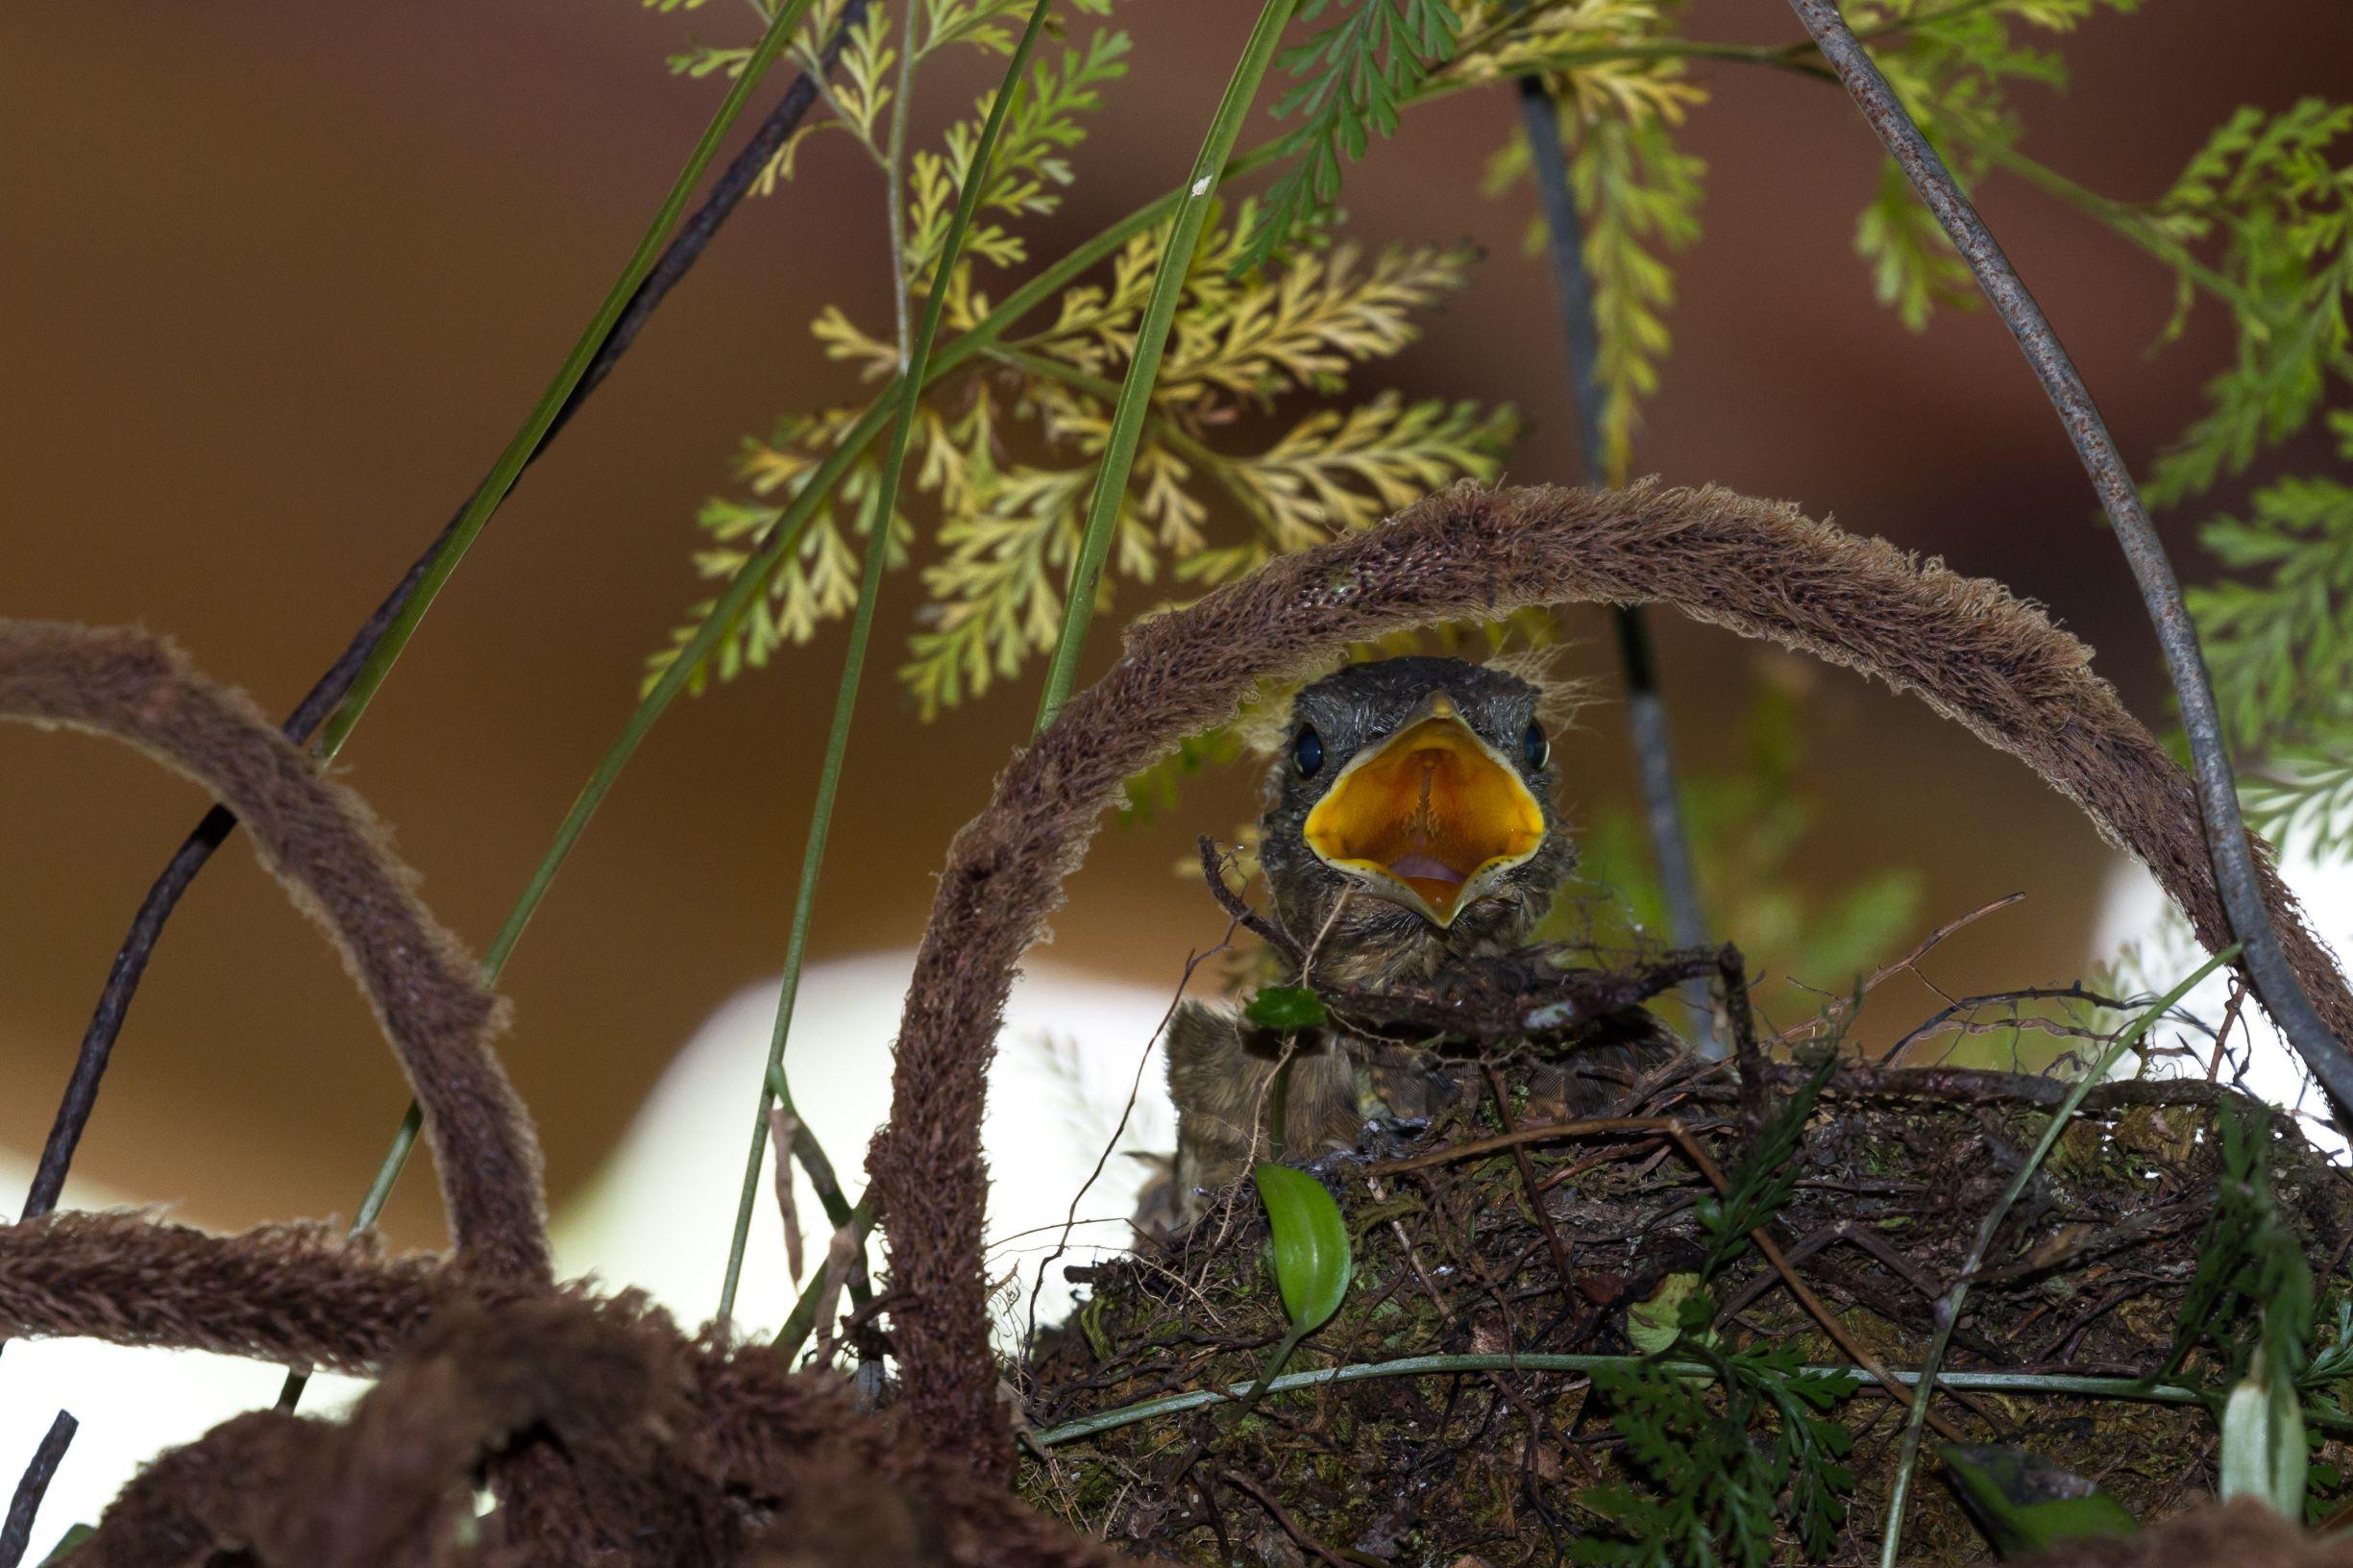 bird infestation